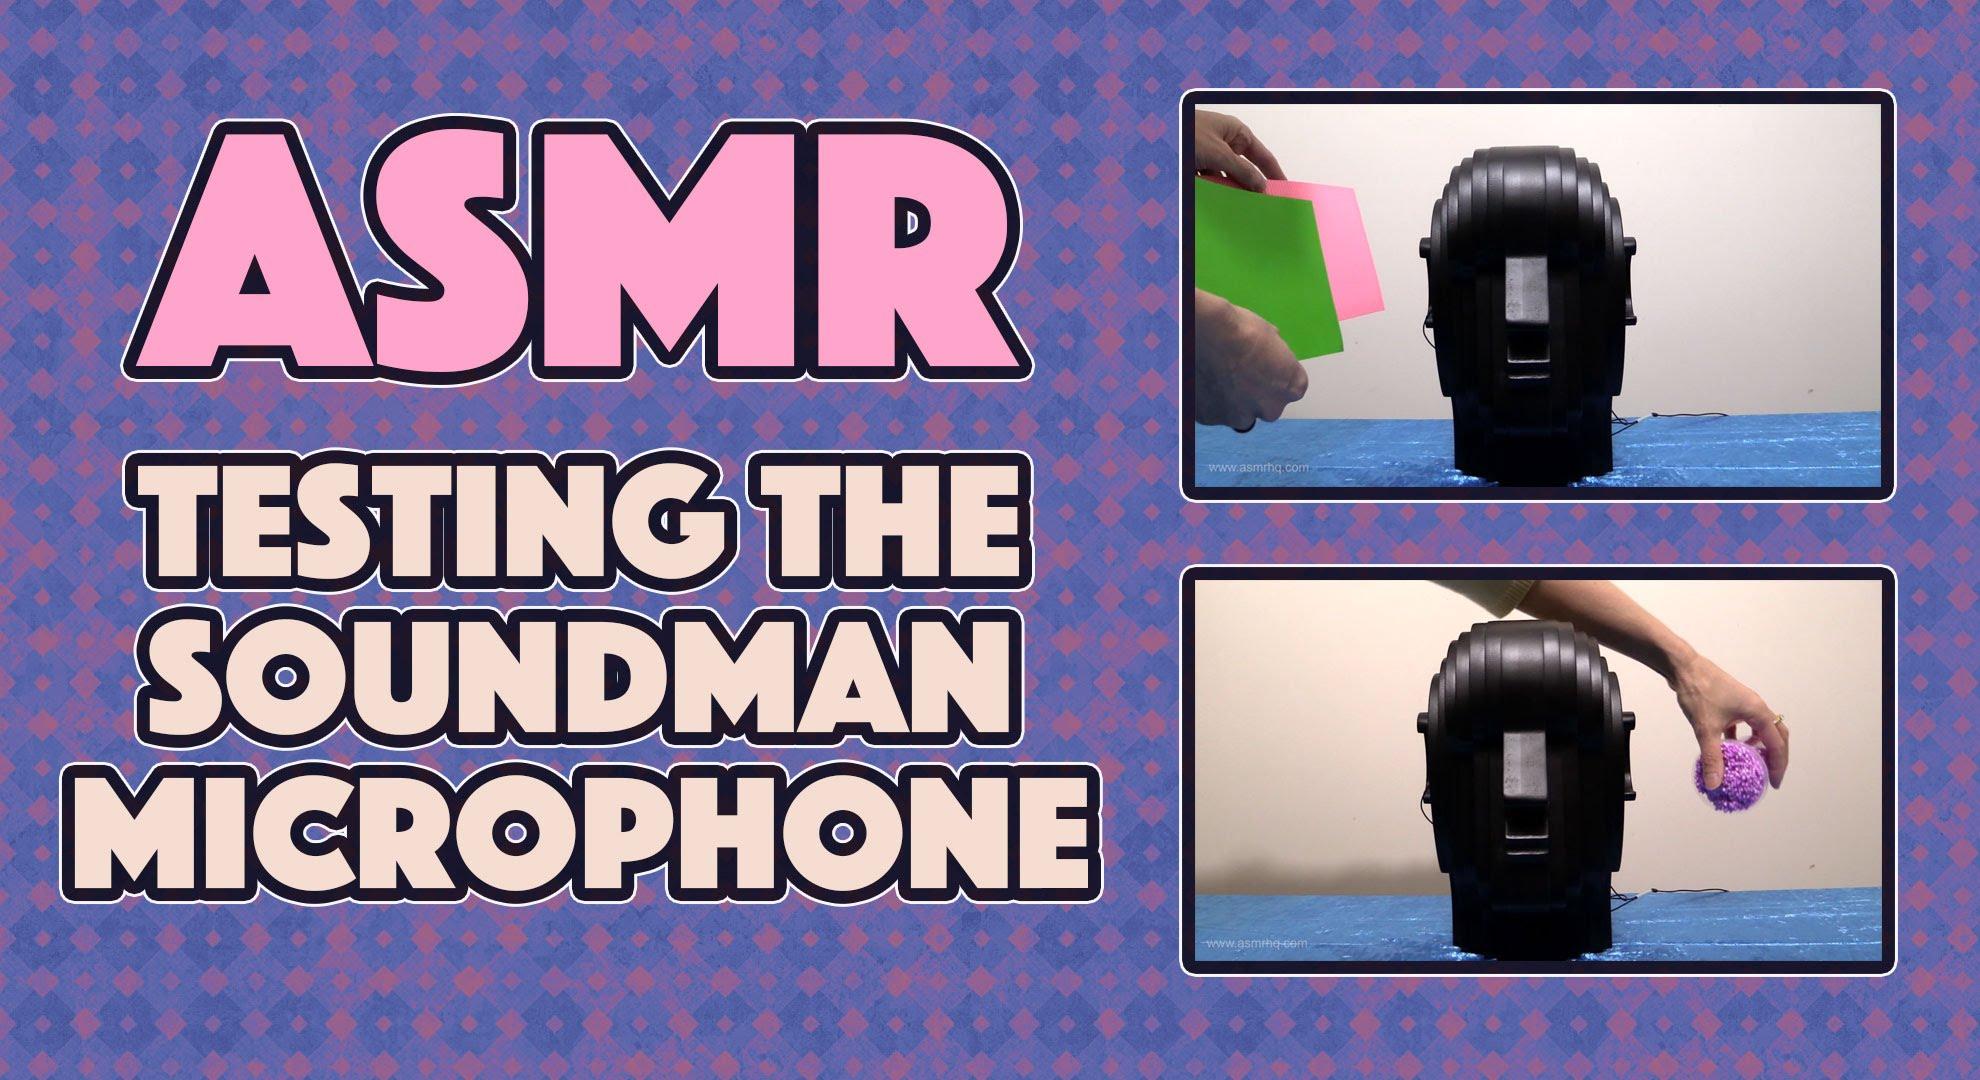 ASMR: 30 Days of Tingles – DAY 20 Testing the Soundman Microphone